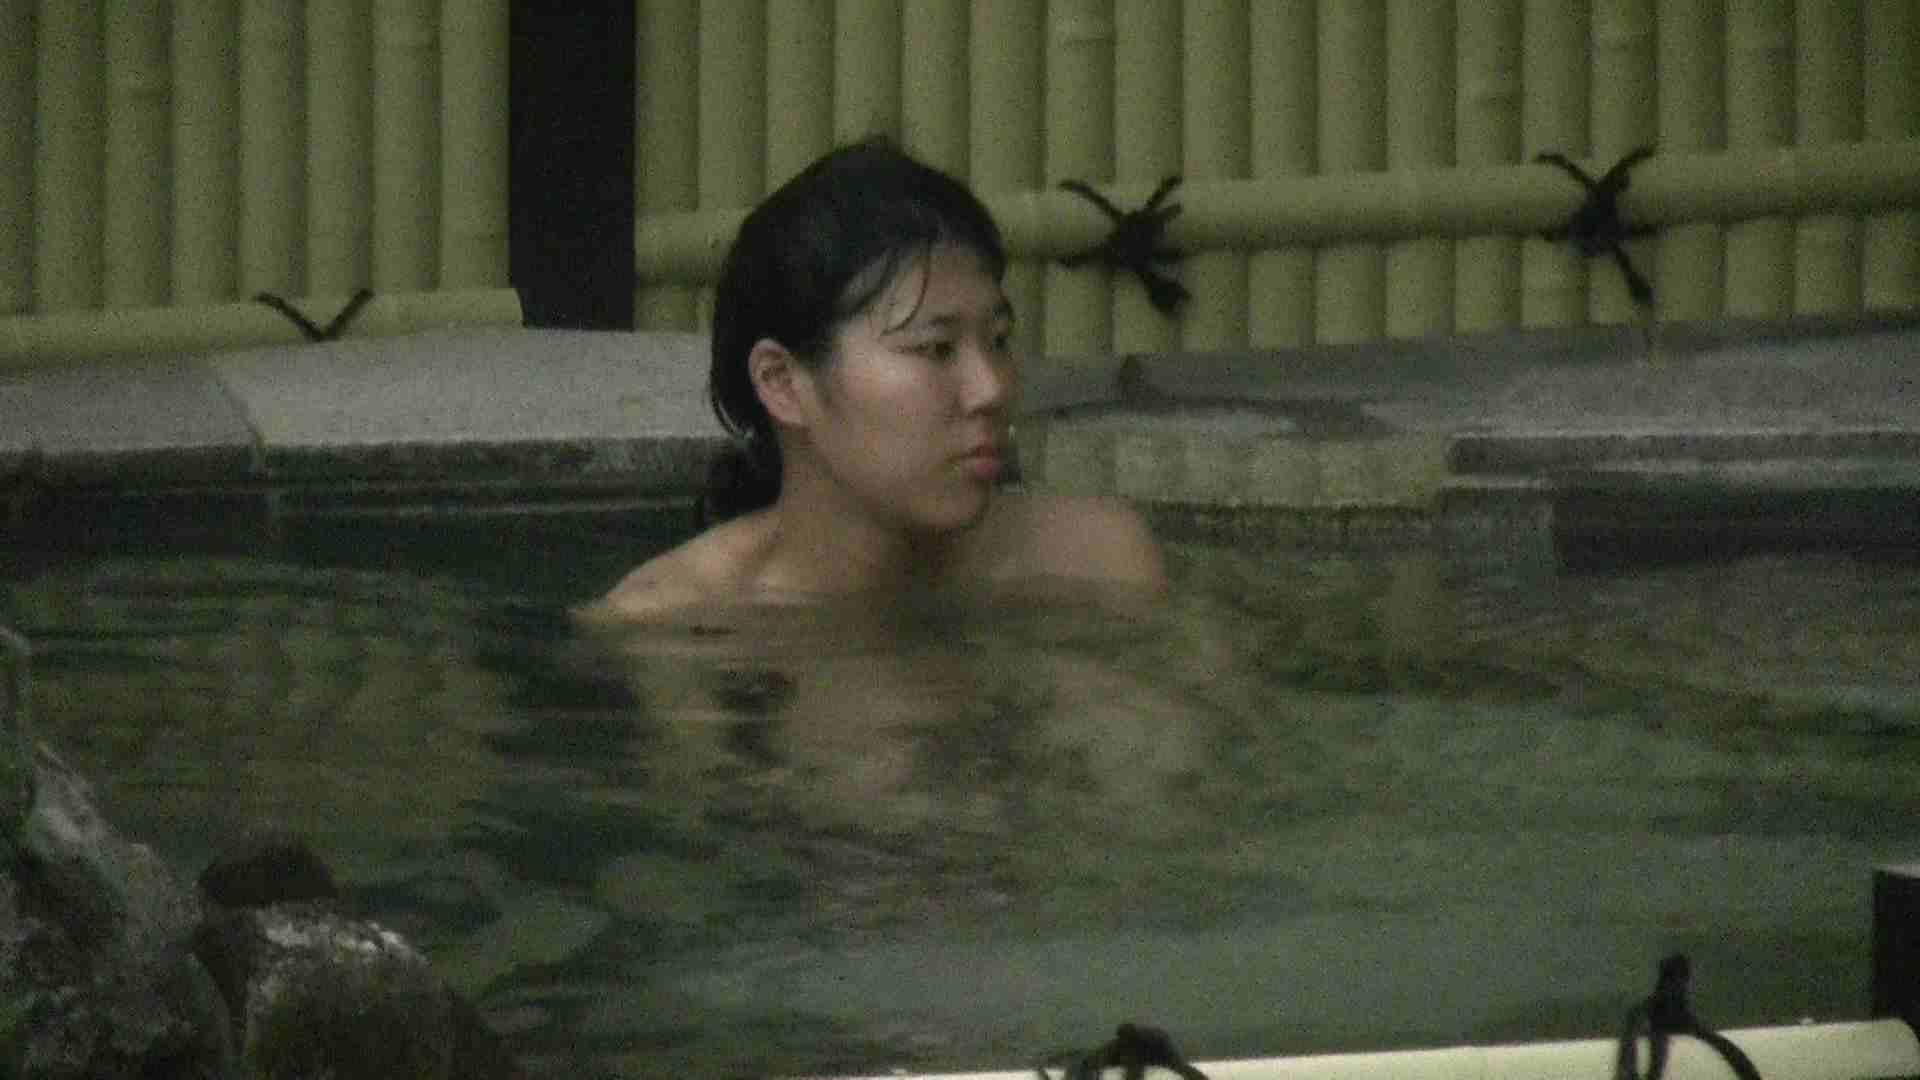 Aquaな露天風呂Vol.215 綺麗なOLたち  106枚 30